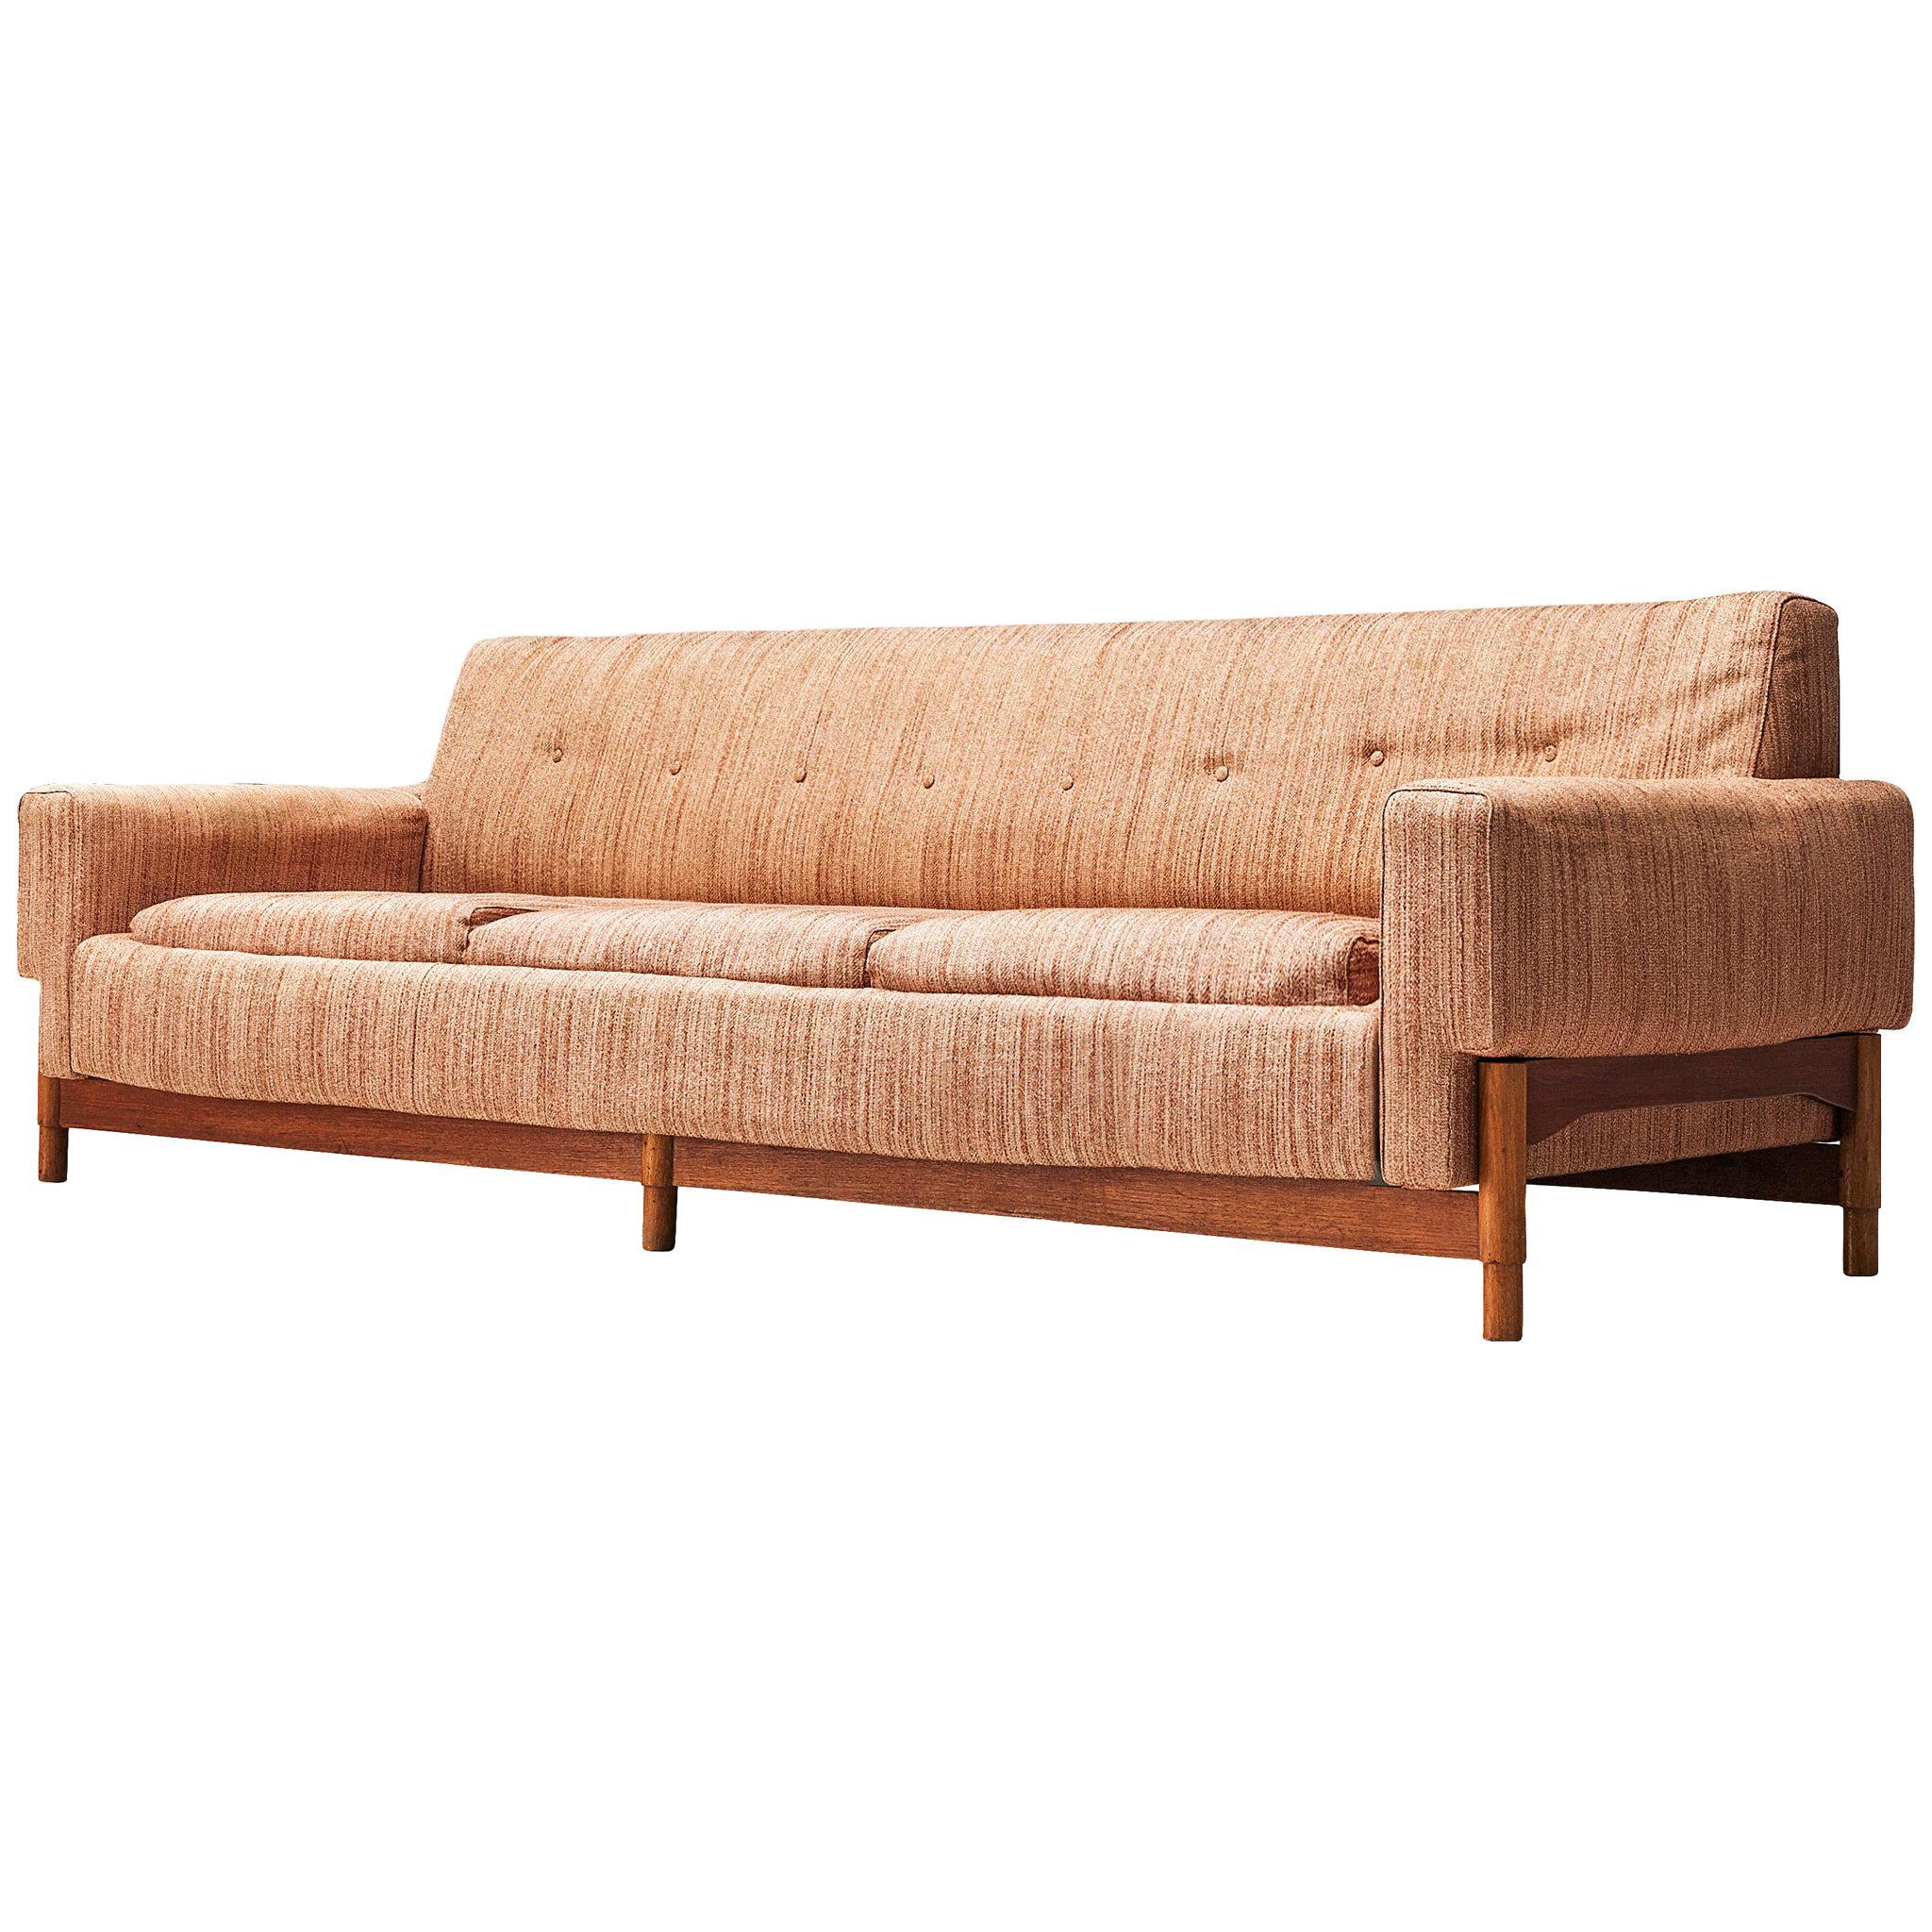 Saporiti Sofa in Teak and Fabric Upholstery